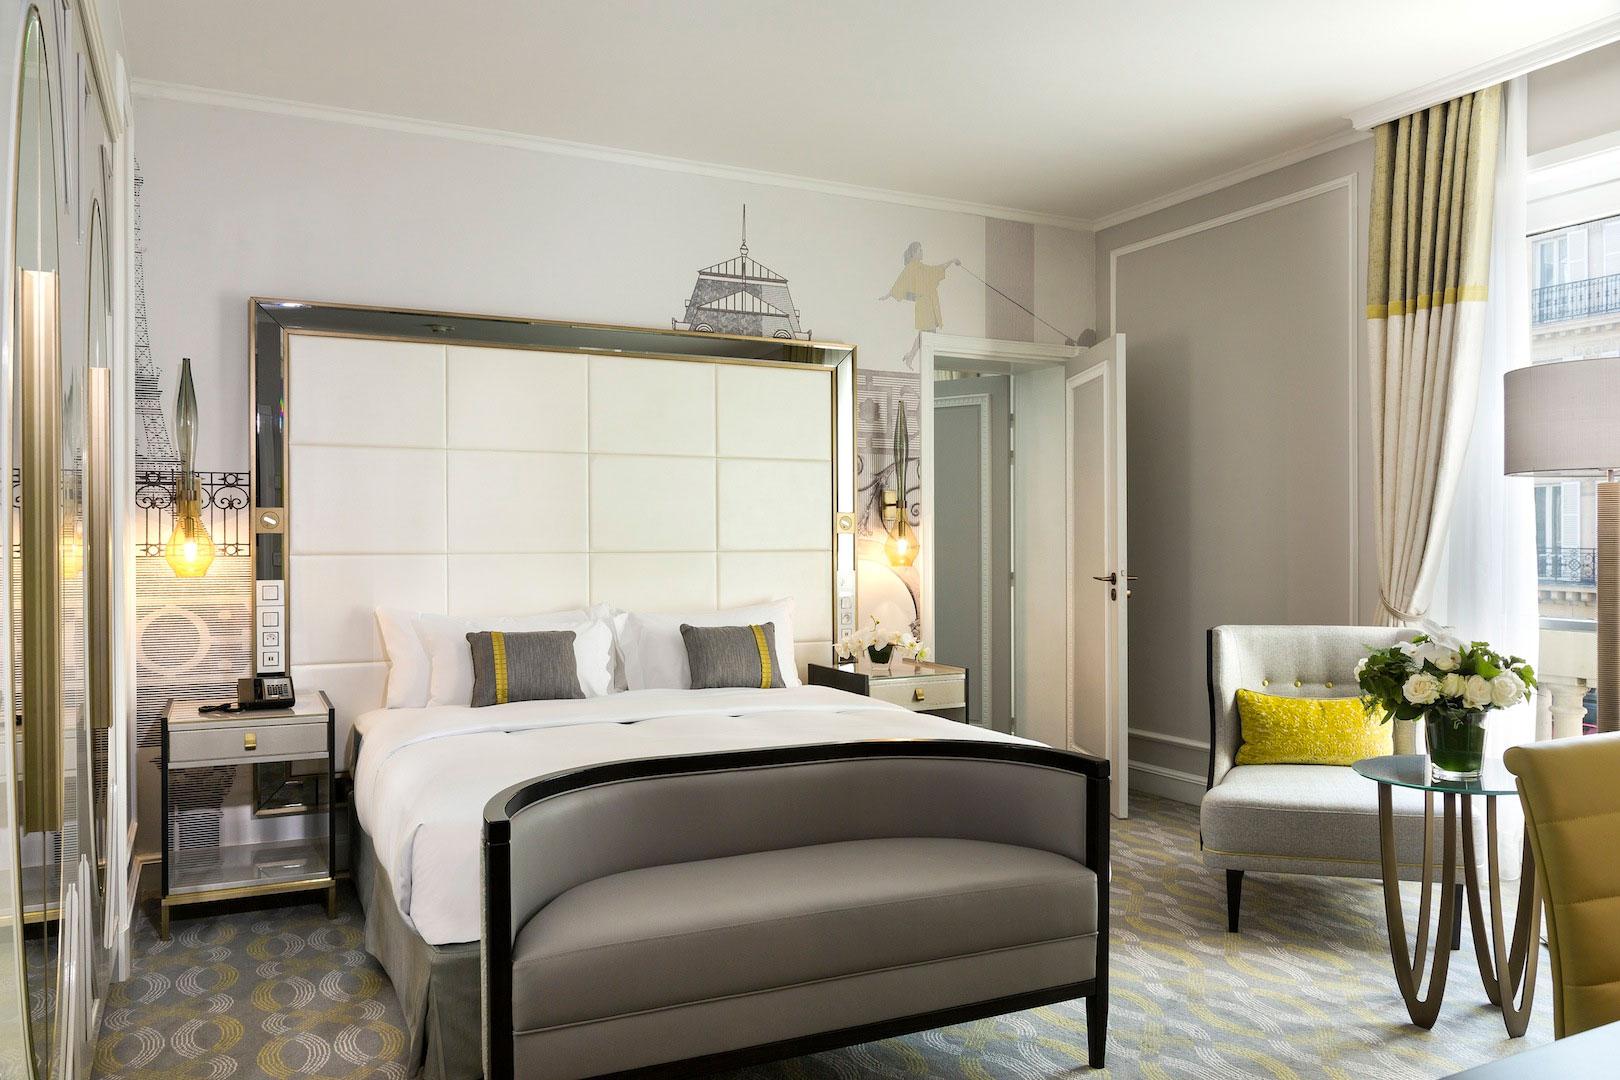 hilton paris opera. Hilton Paris   50M Renovation Adds New Life to the Historic Property